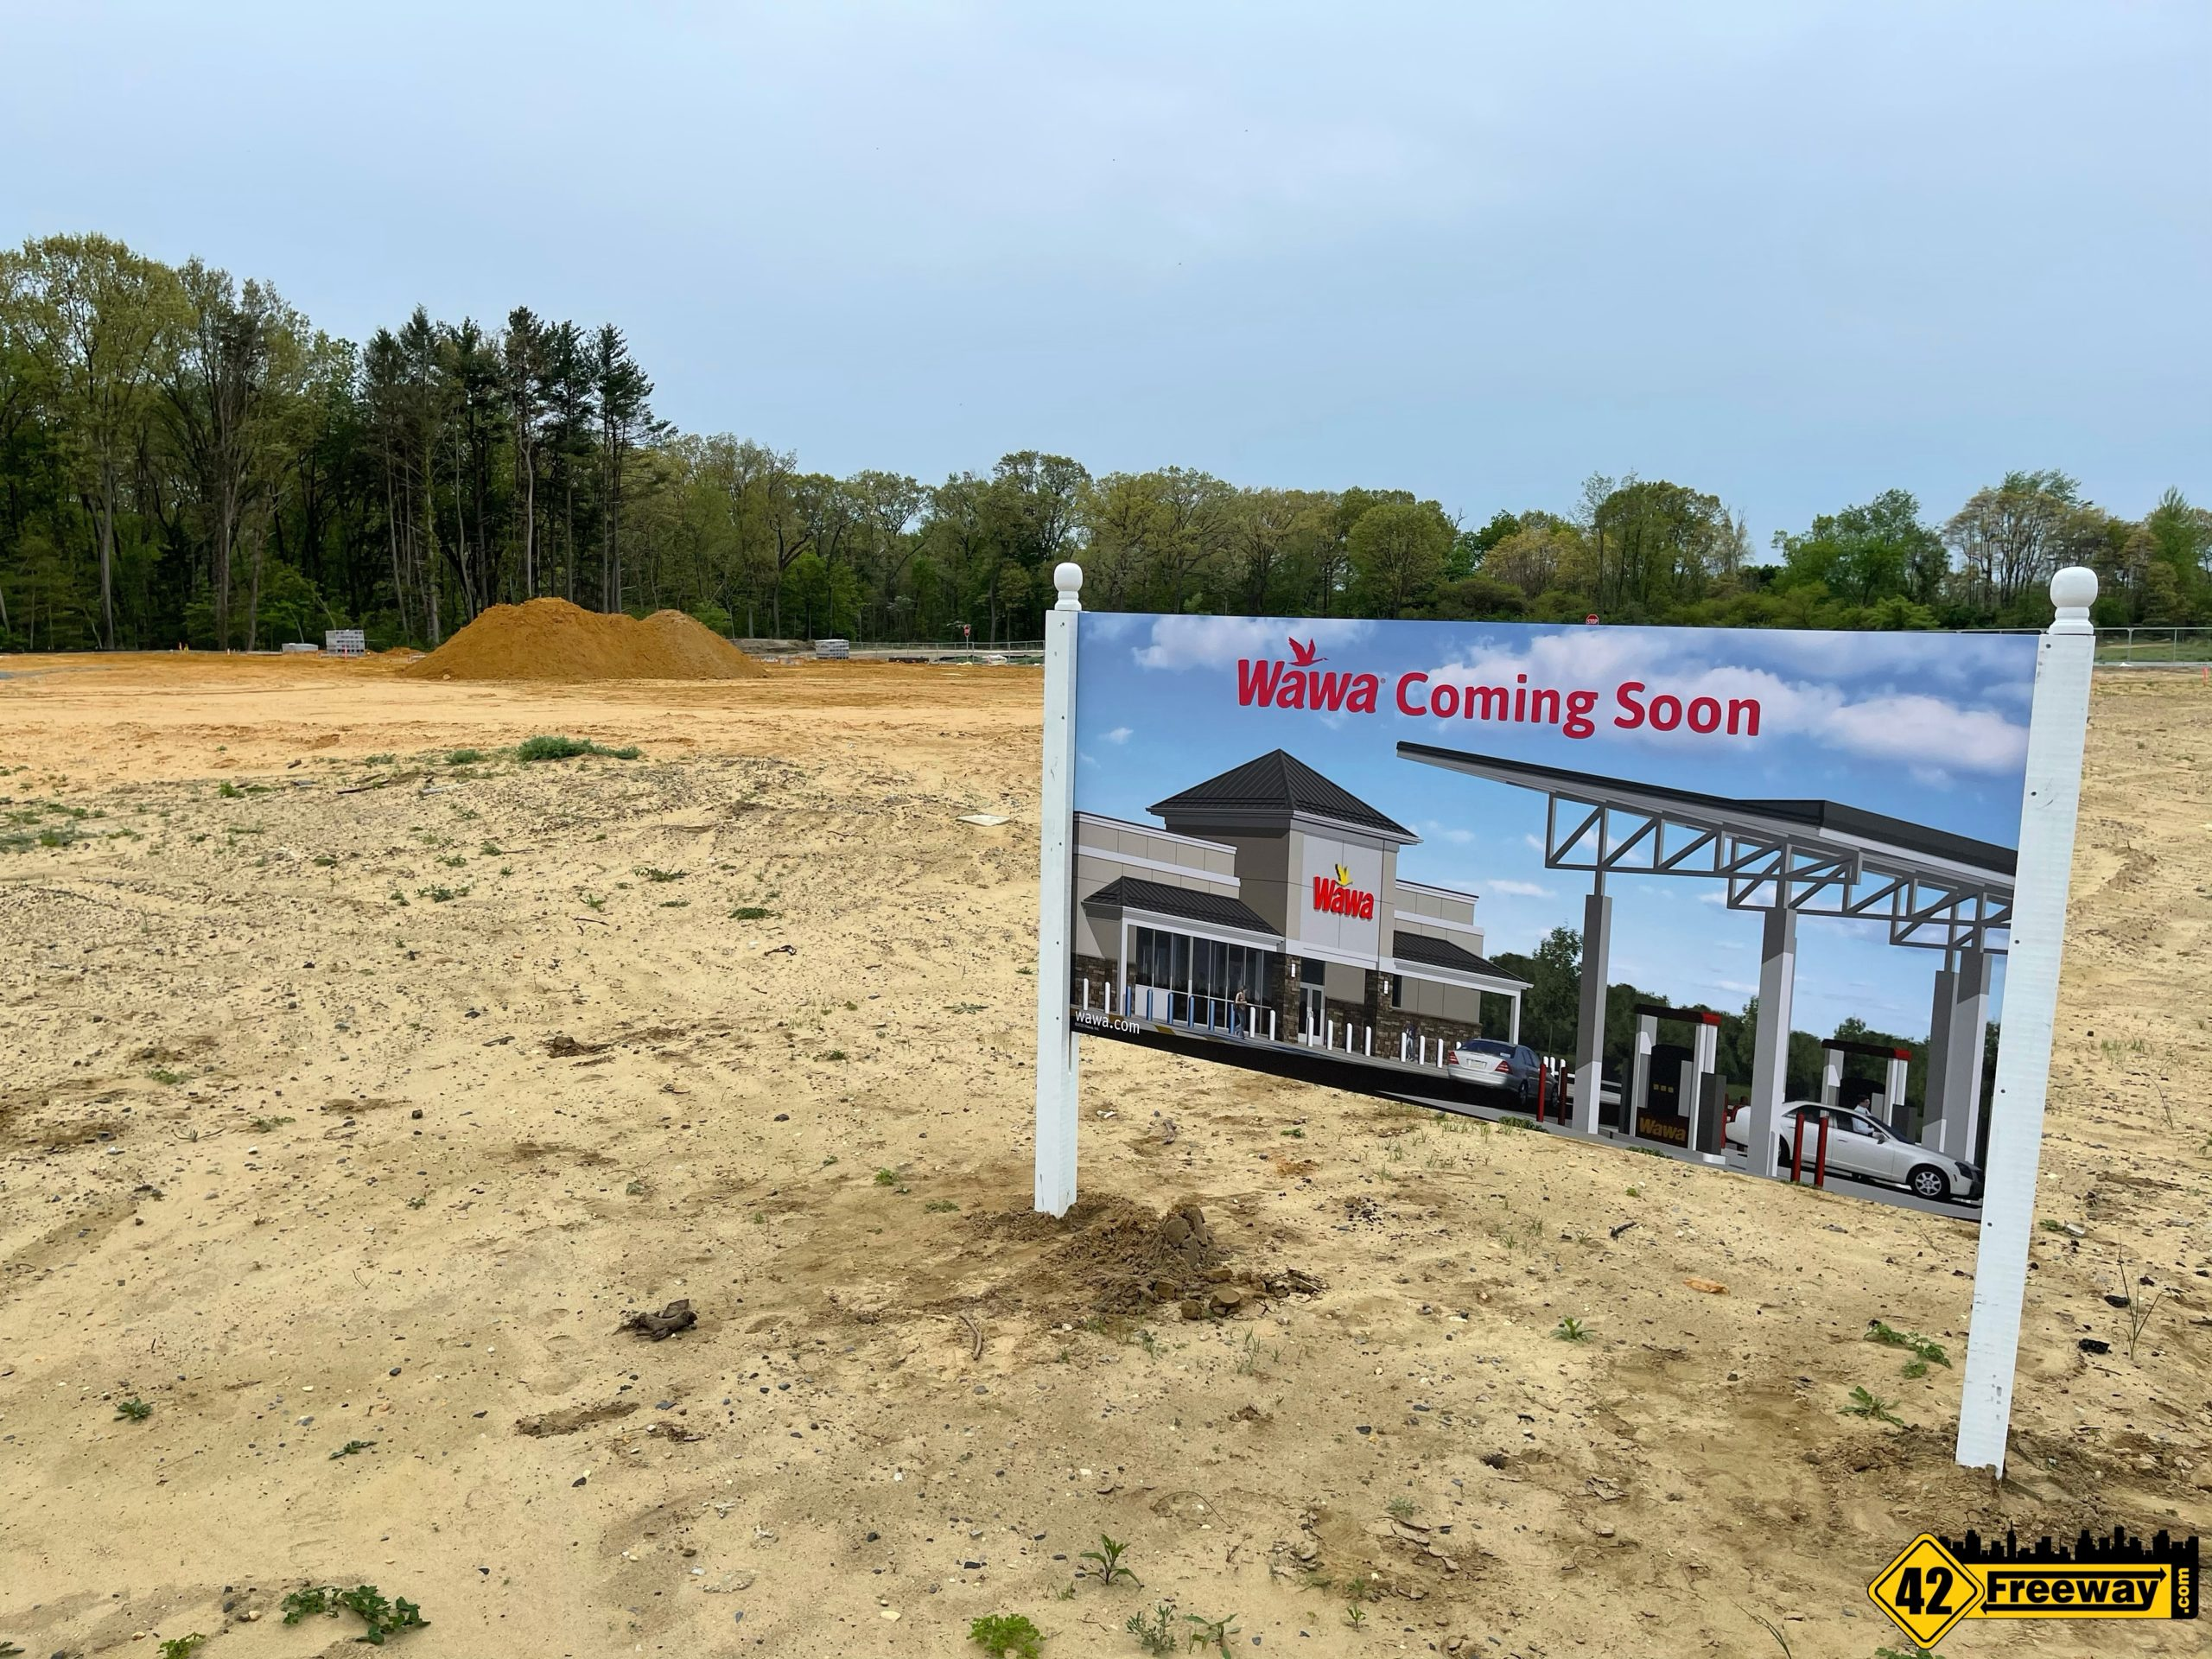 Super Wawas: Deptford Building Starts, Washington Township 5-Points Still Working On Approvals